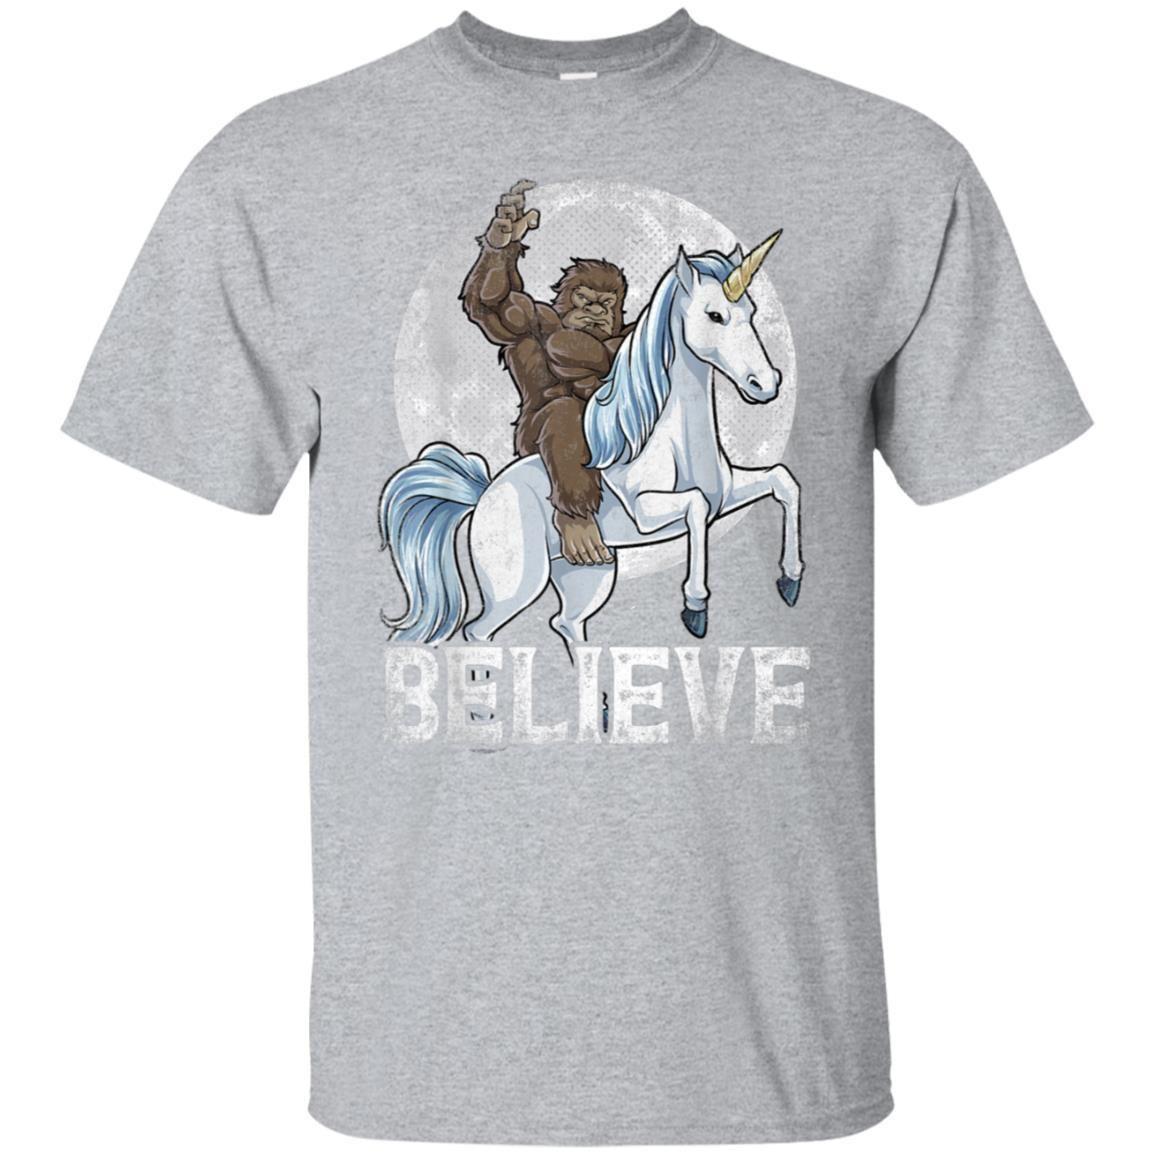 7a59abb1 99promocode Bigfoot Riding Unicorn T Shirt Funny Sasquatch Vintage Tees